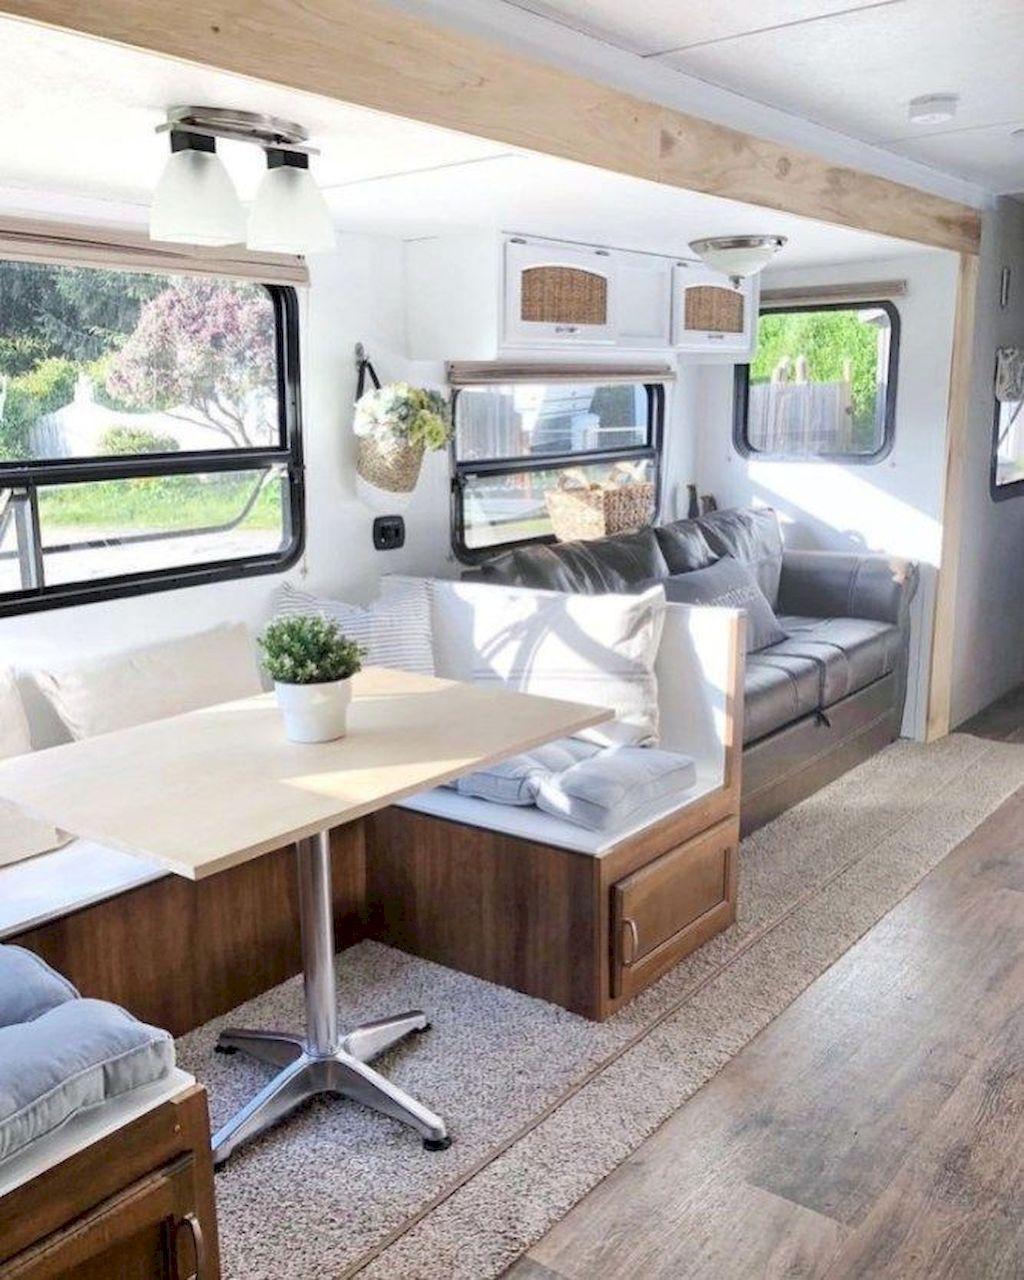 Camper Trailer Inside Design Concepts For You With Images